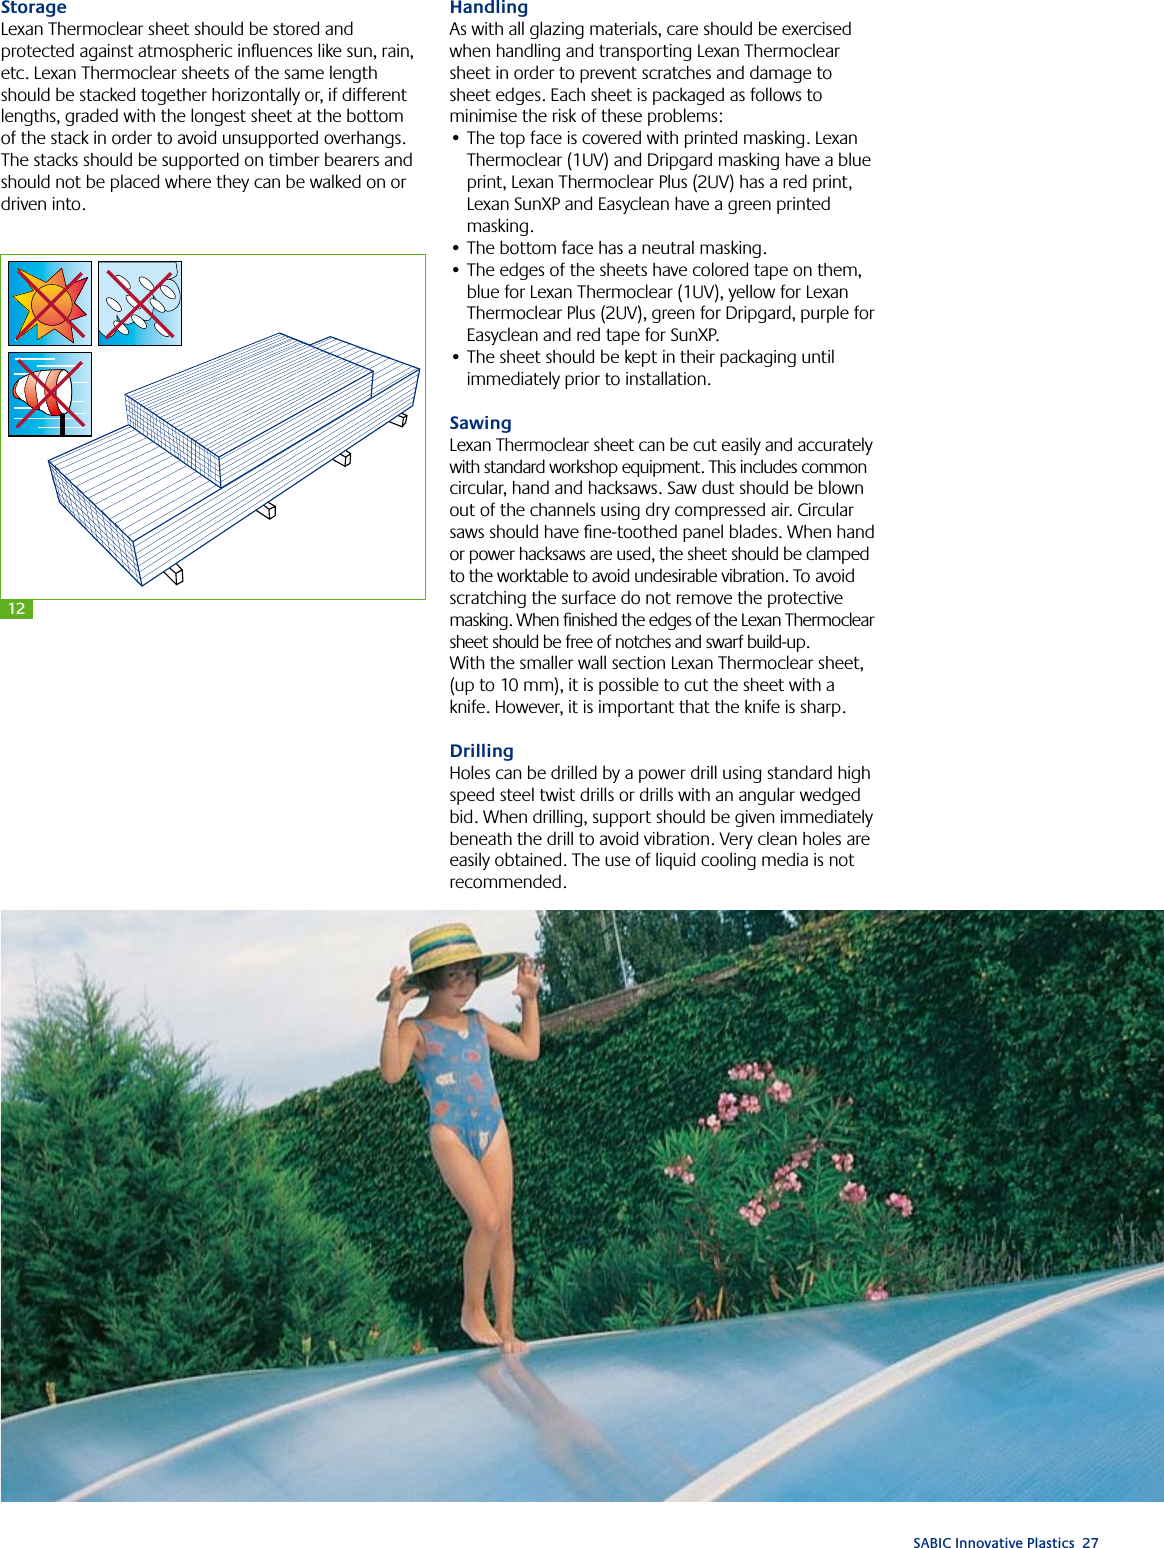 Lexan Thermoclear Technical Manual